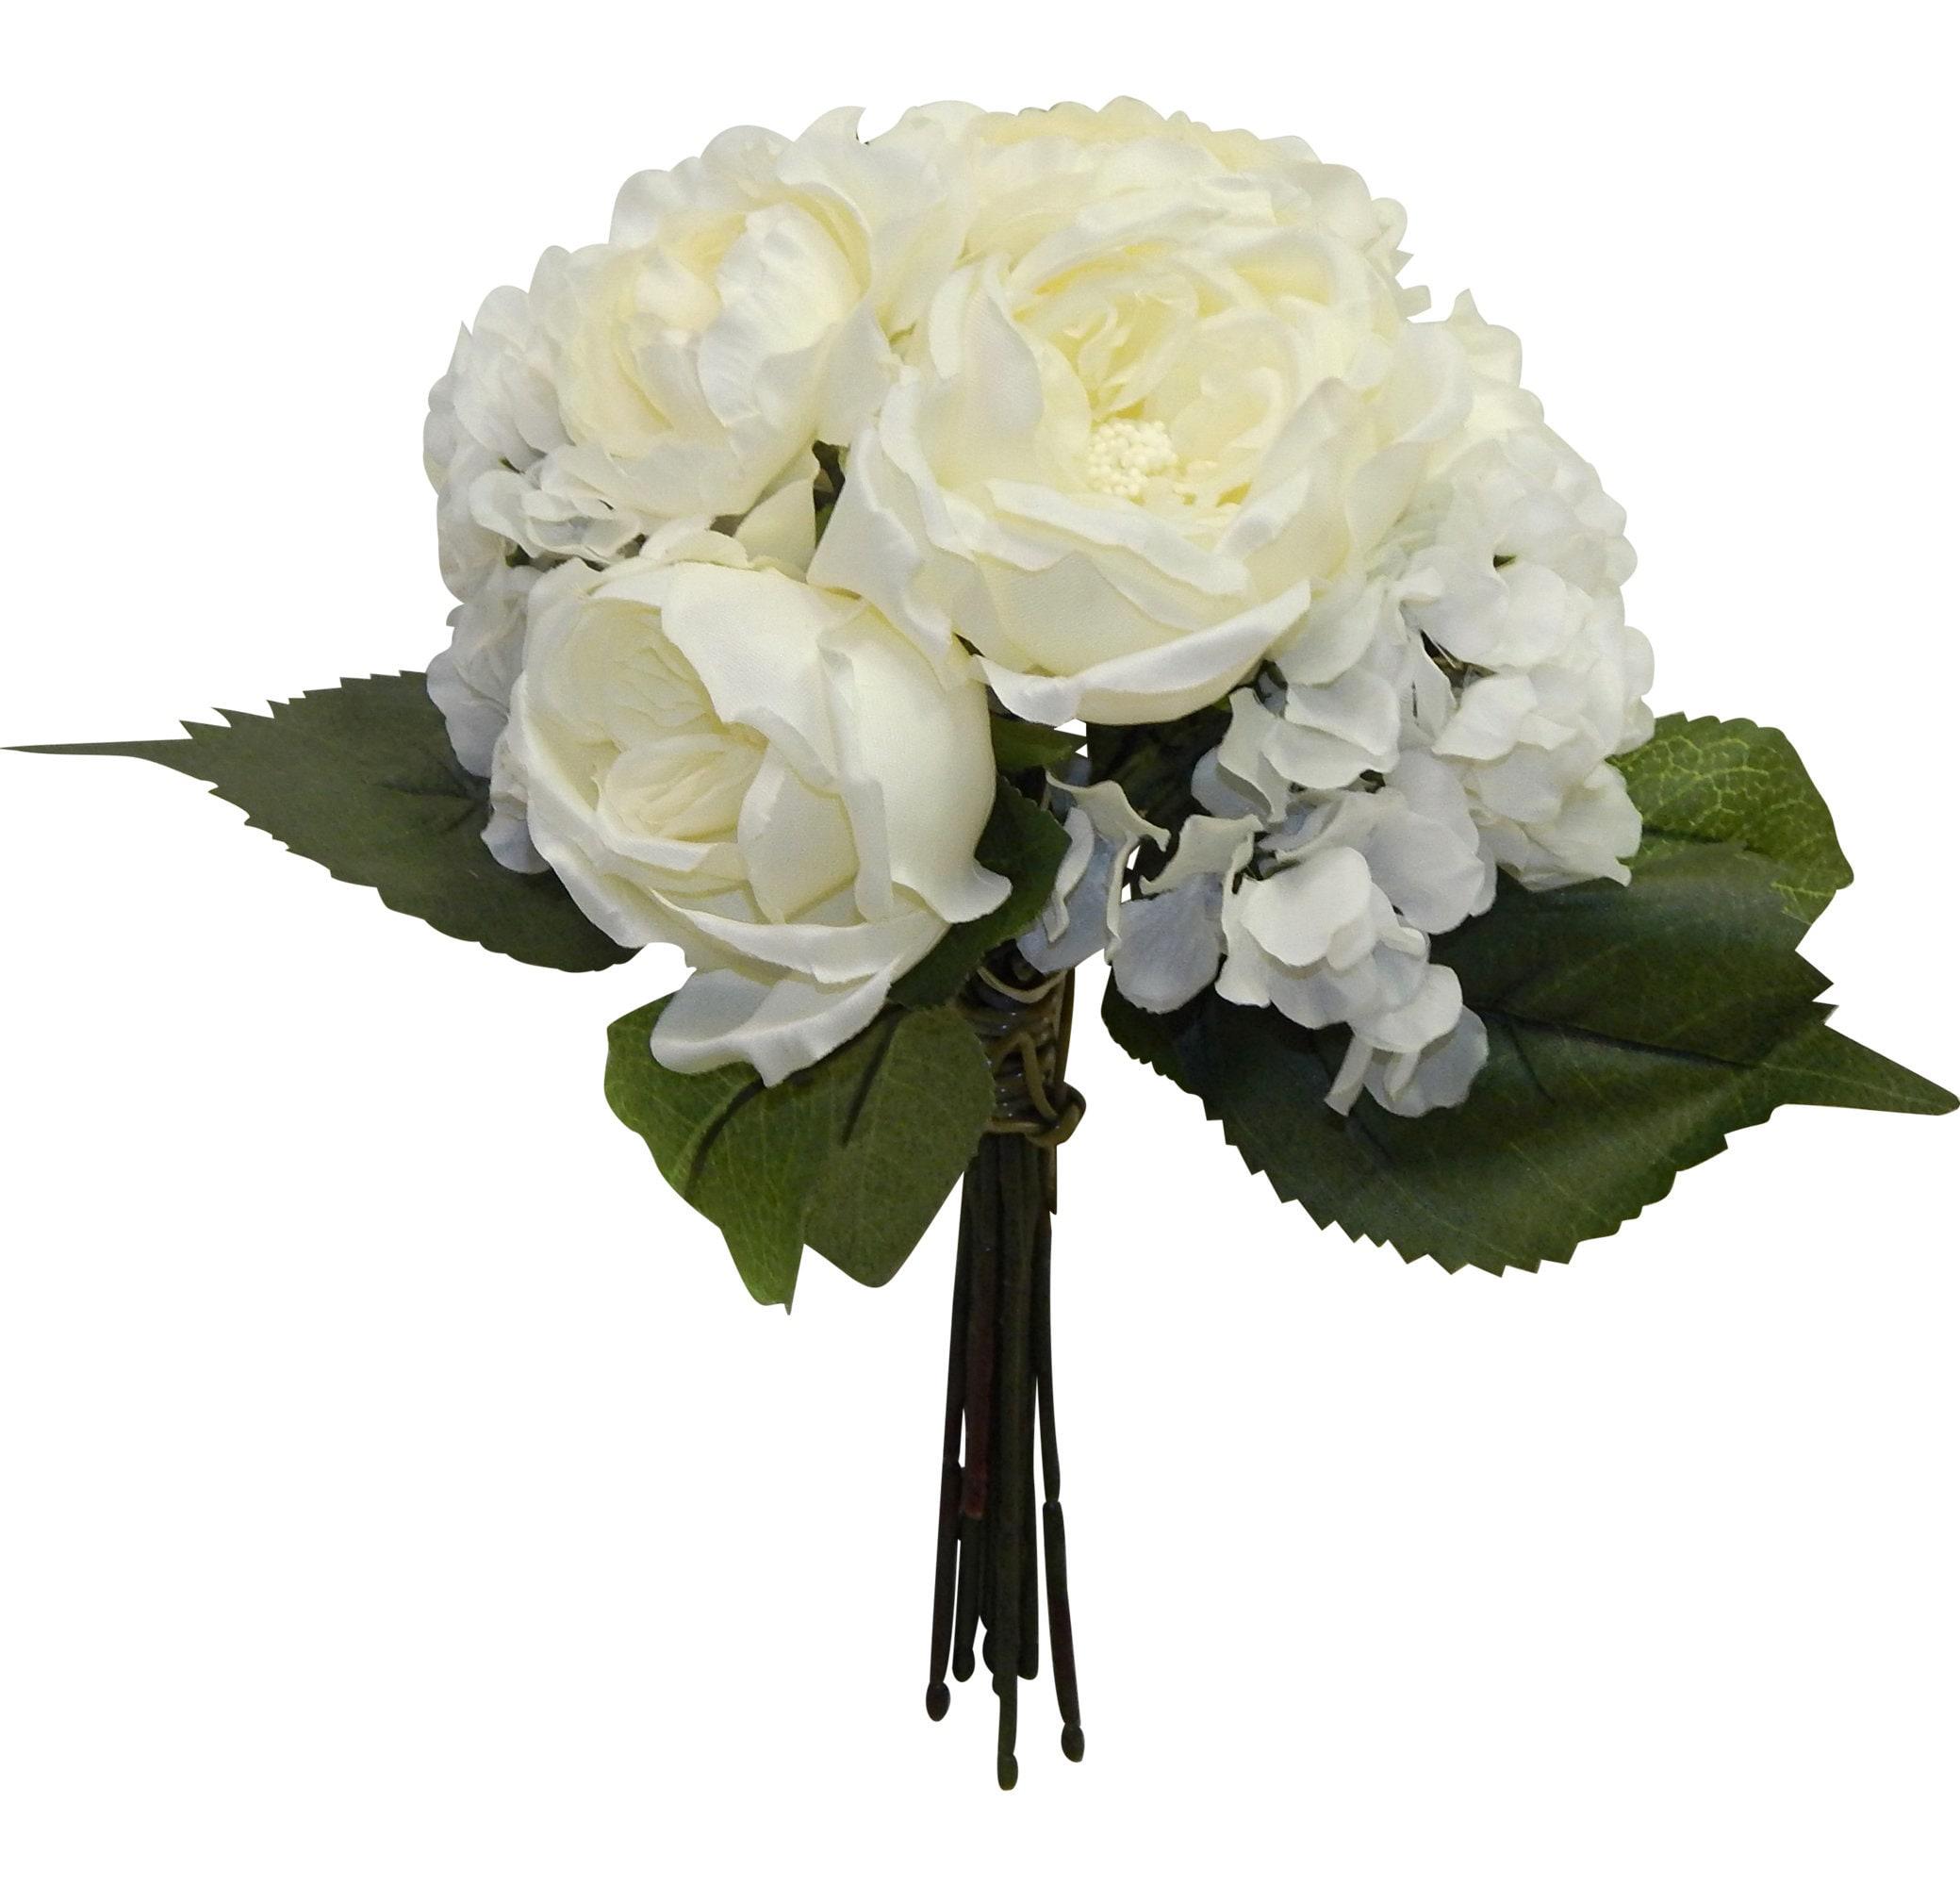 Cream Off White Cabbage Roses Hydrangeas Bouquets Bride Etsy